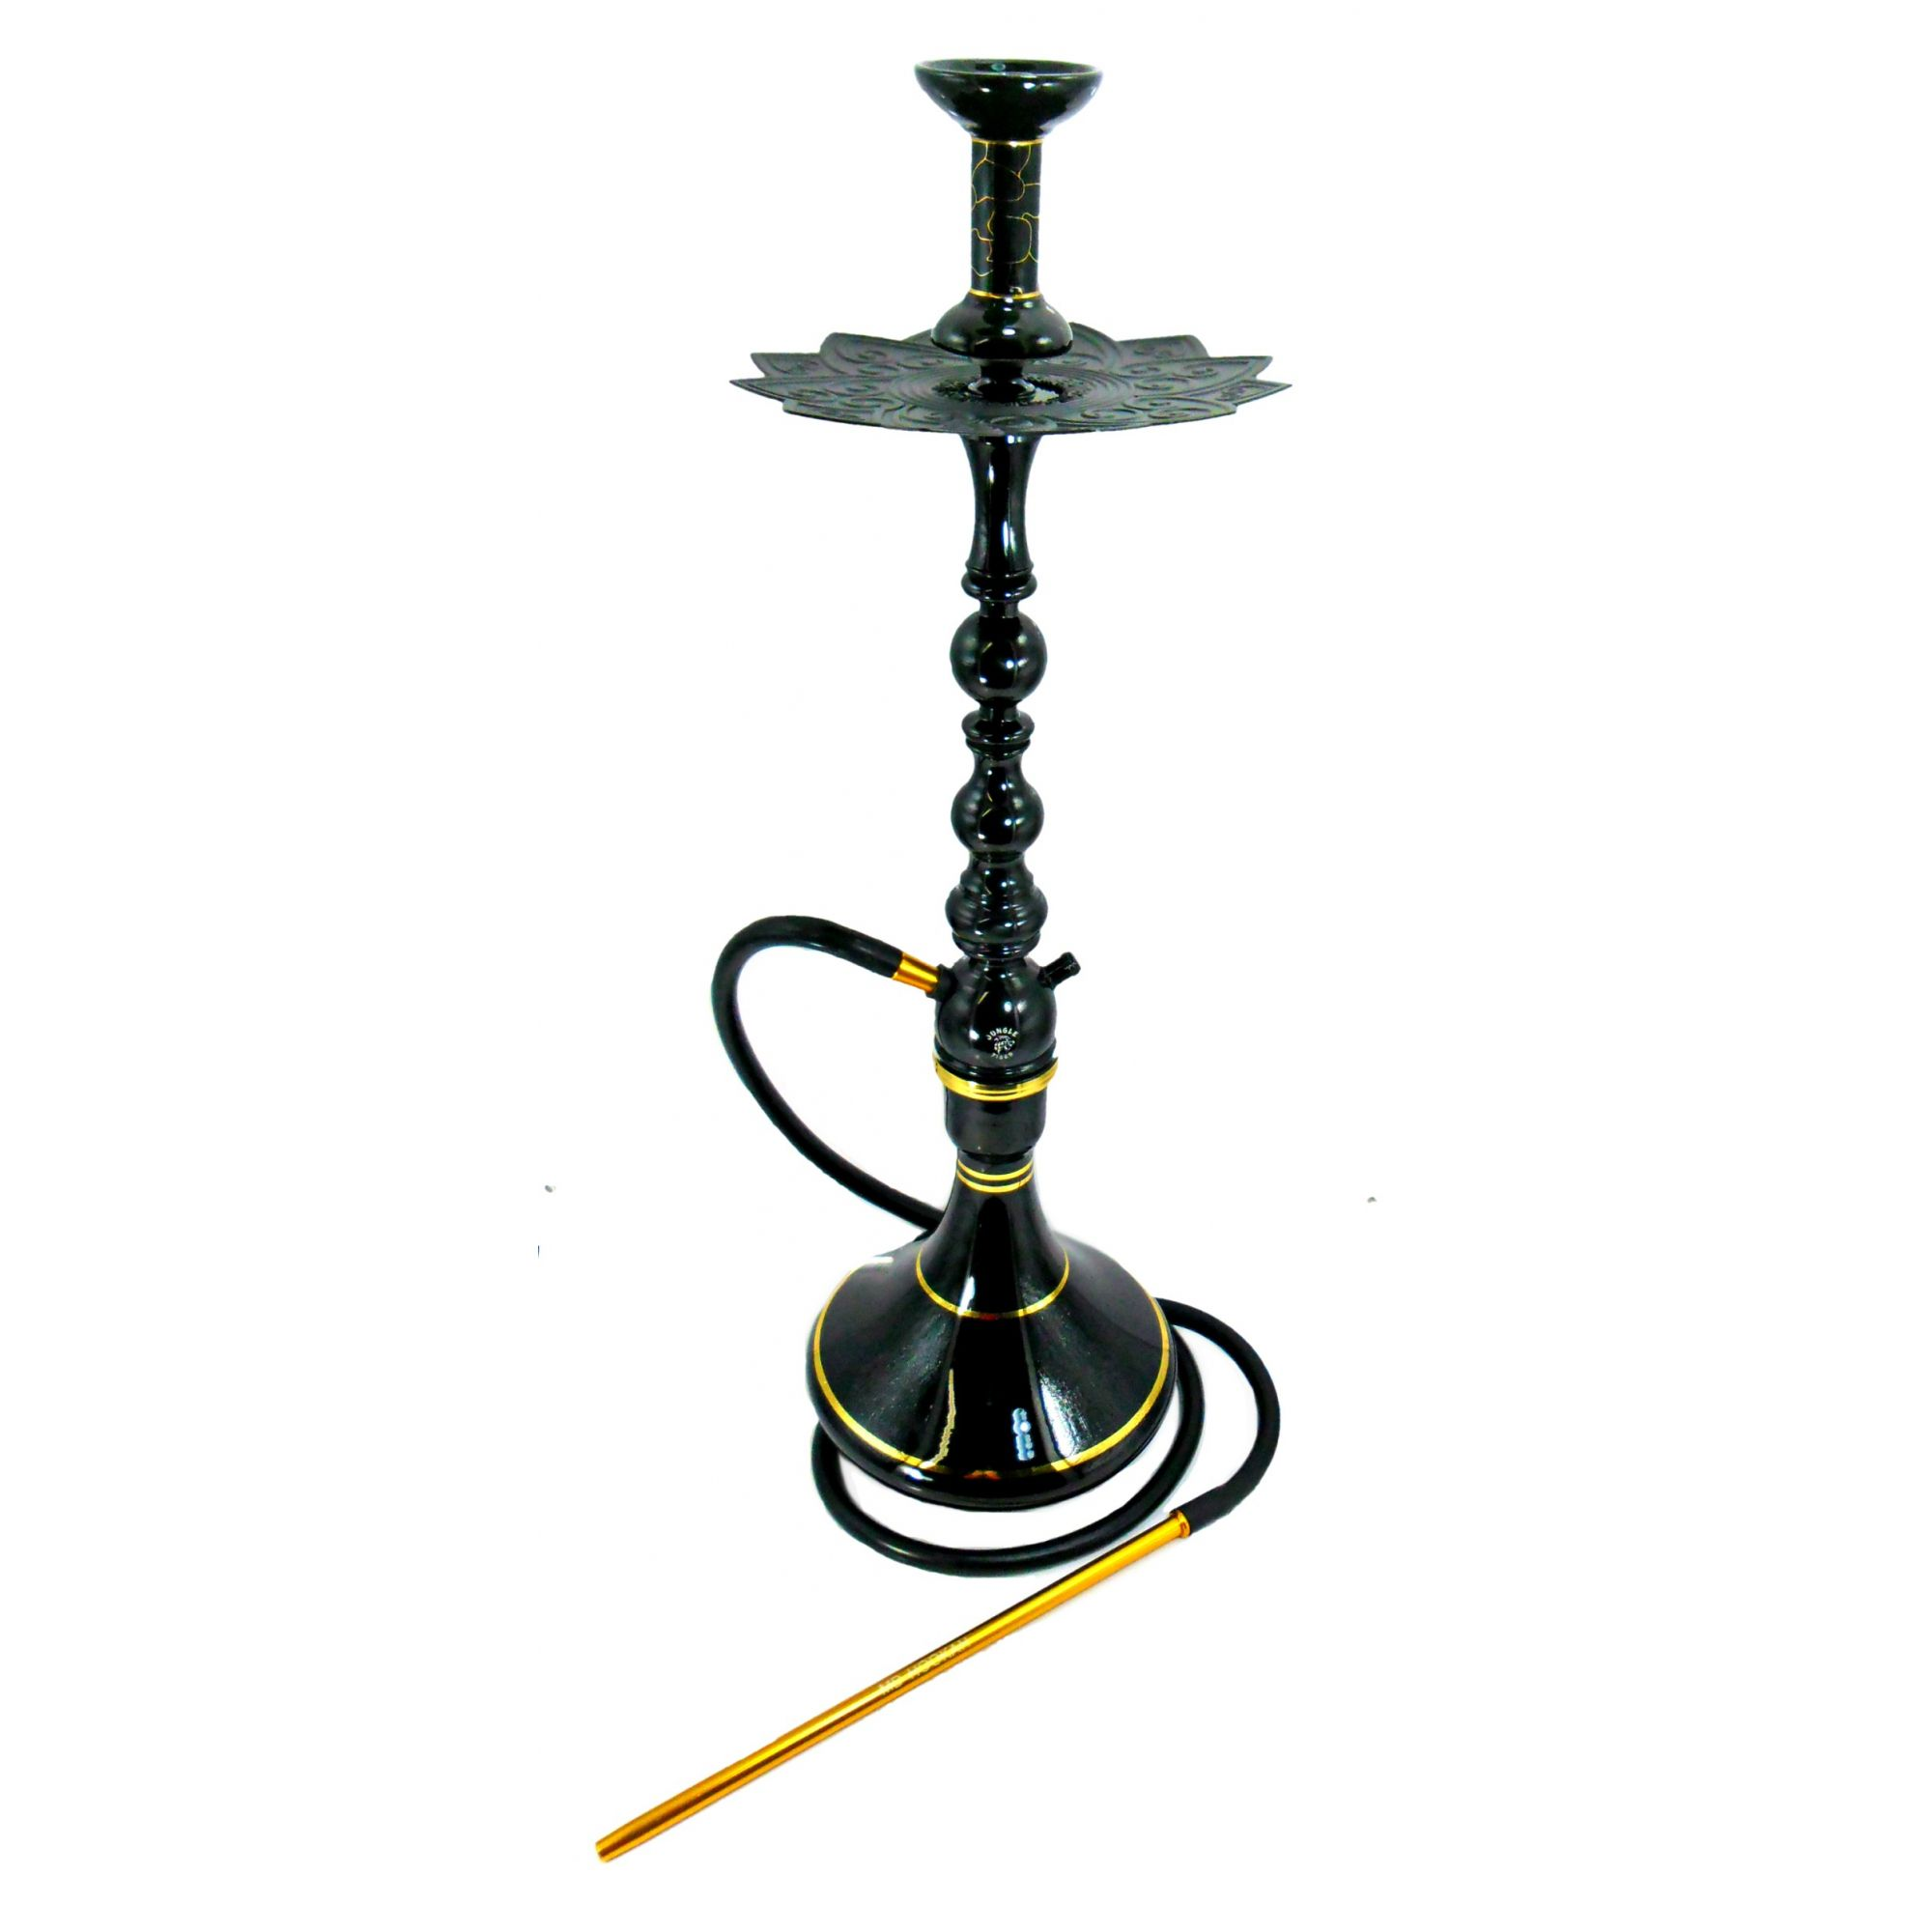 Narguile TIGER PRETO alumínio, dutado, híbrido (monte grande ou pequeno), vaso Aladin preto, mang. antichamas, 68cm.